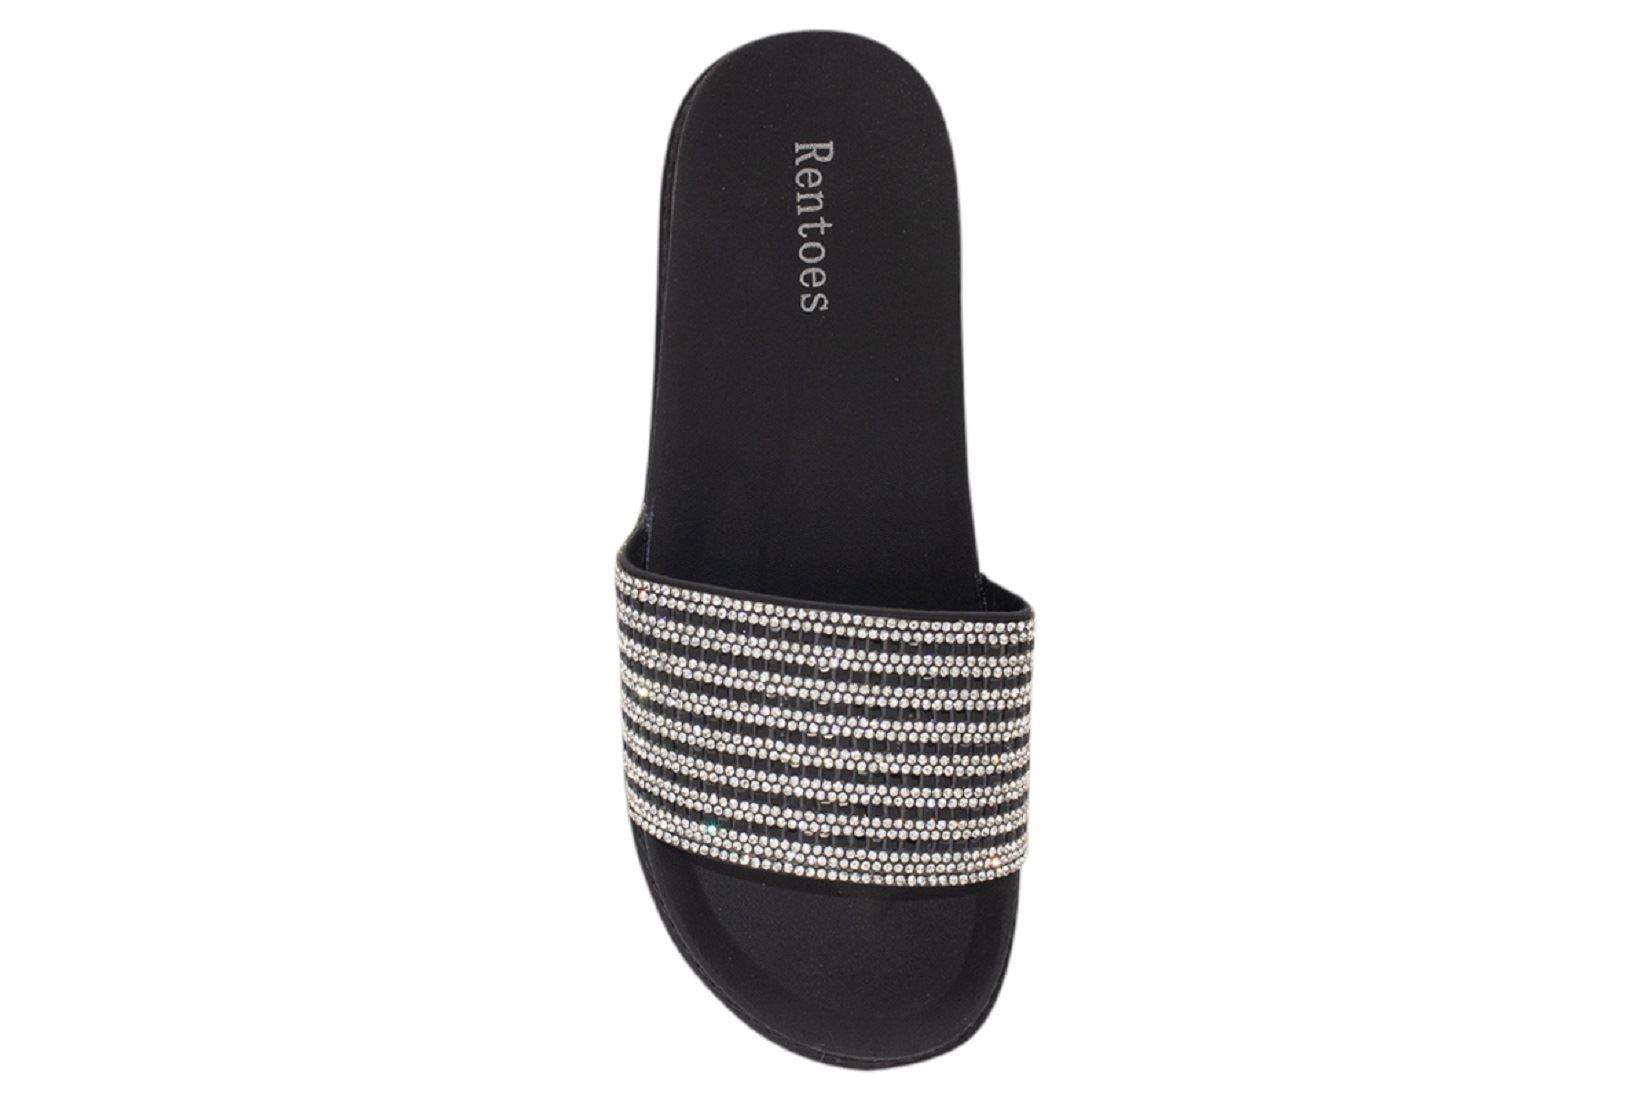 Womens-Sliders-Casual-Slippers-Mules-Ladies-Diamante-Flip-Flop-Sandals-Shoes thumbnail 10